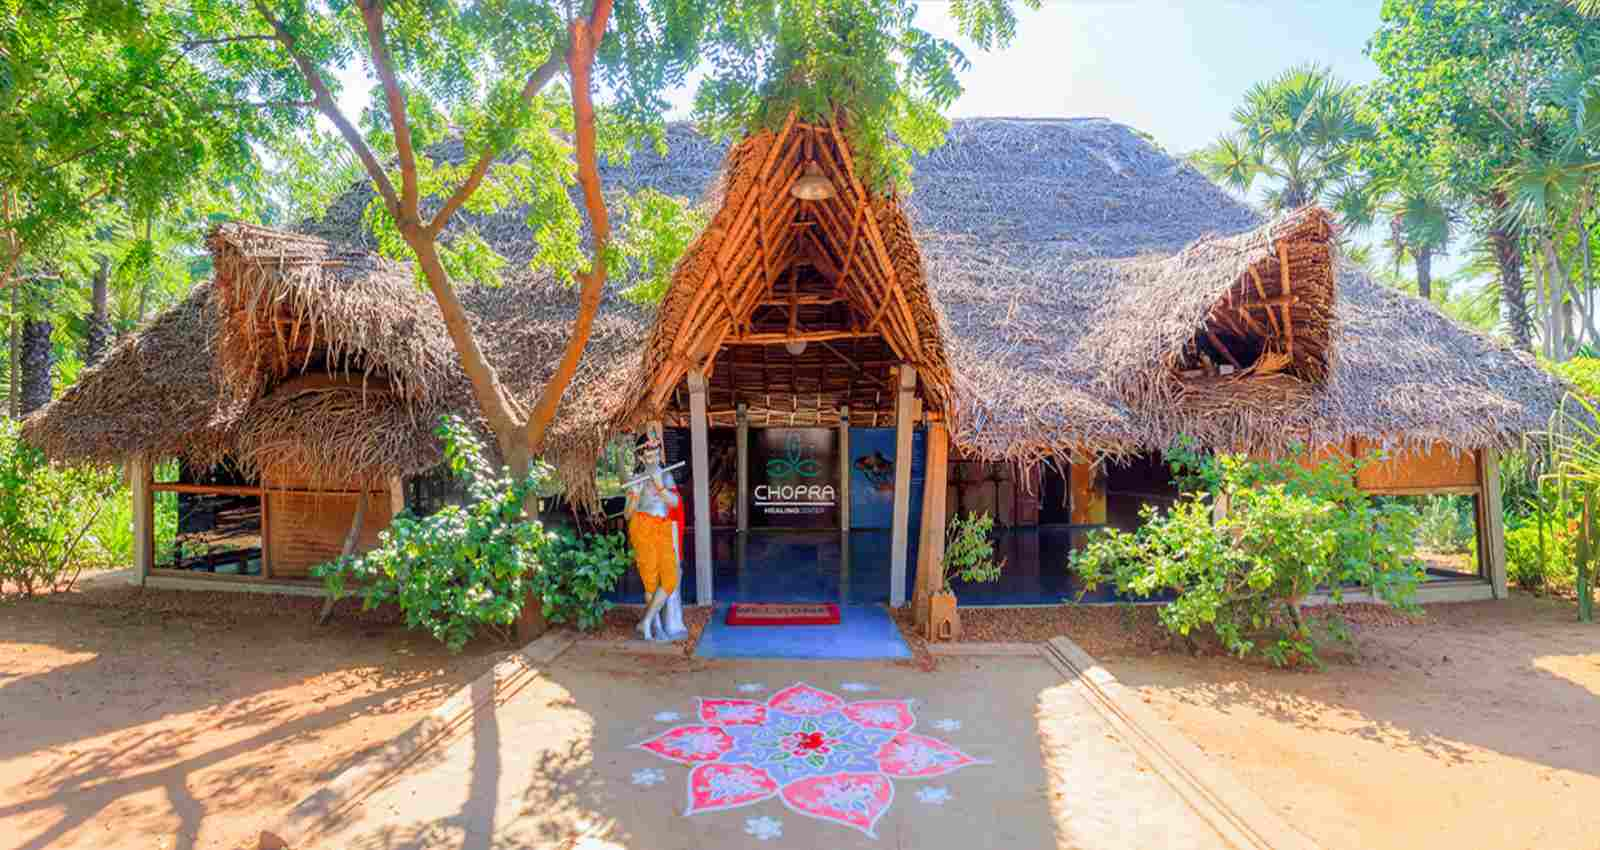 Deepak Chopra Healing Center entrance-Ayurveda, Yoga and meditation in India